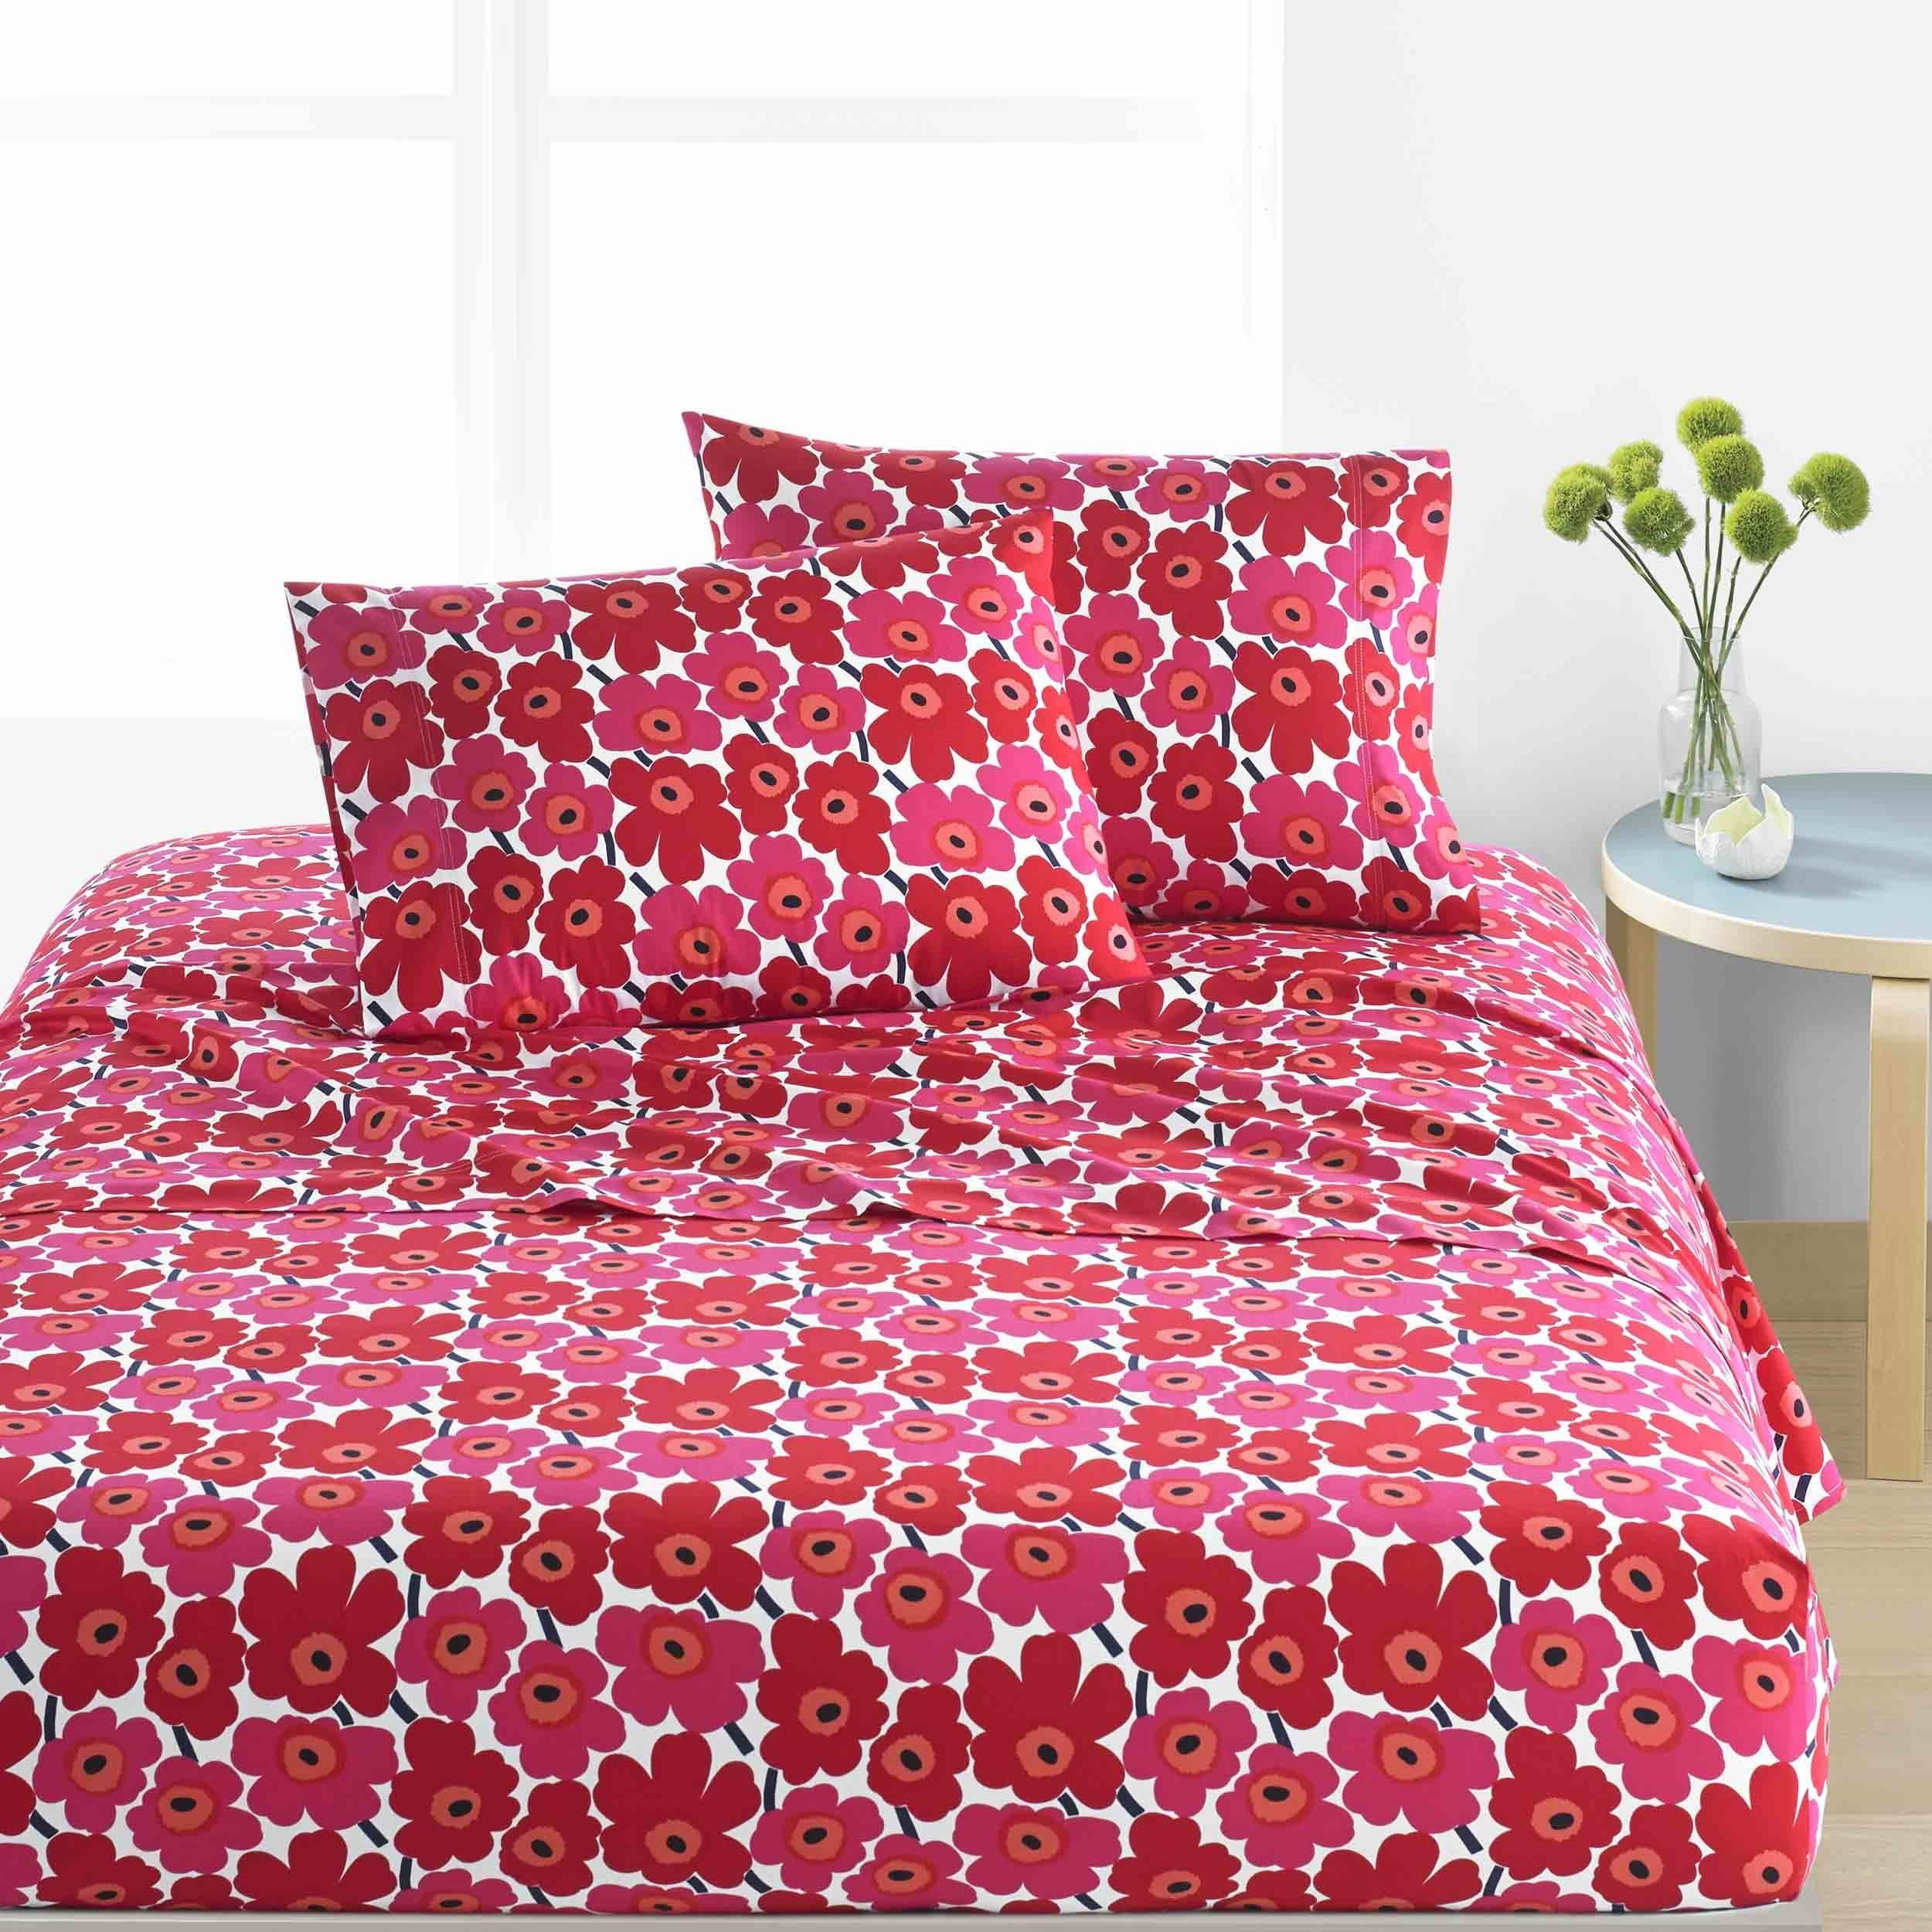 free today product bedding marimekko shipping bath set overstock unikko red bed duvet cover